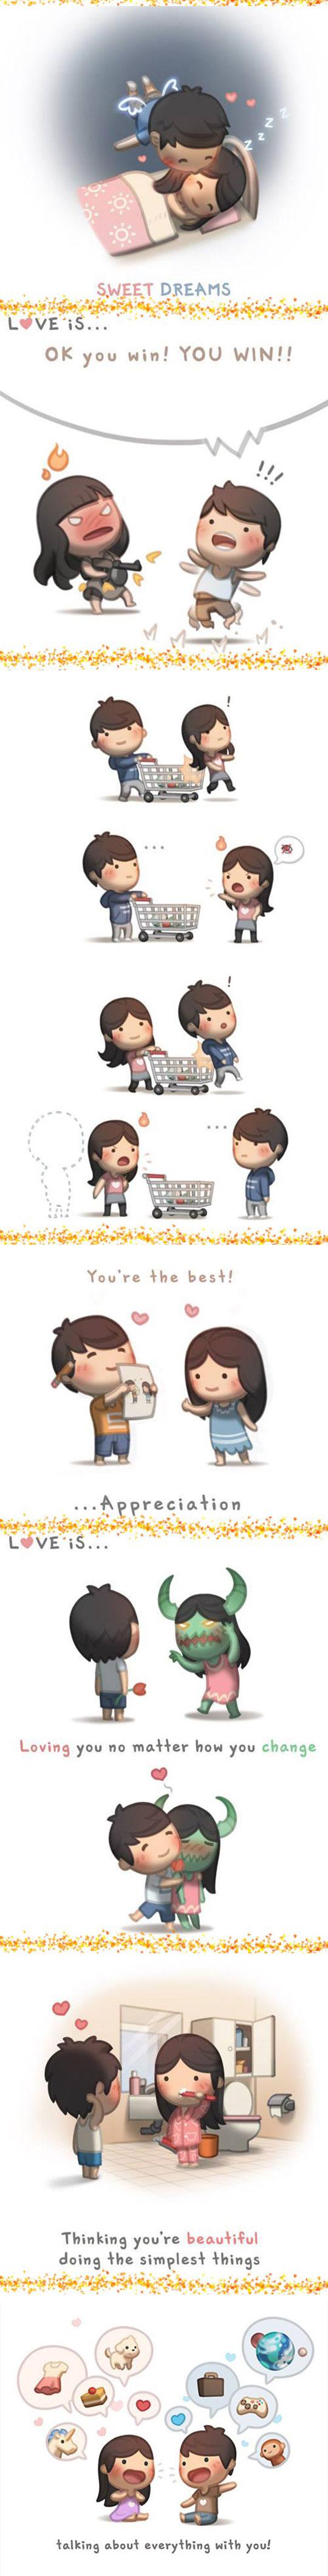 ljubove